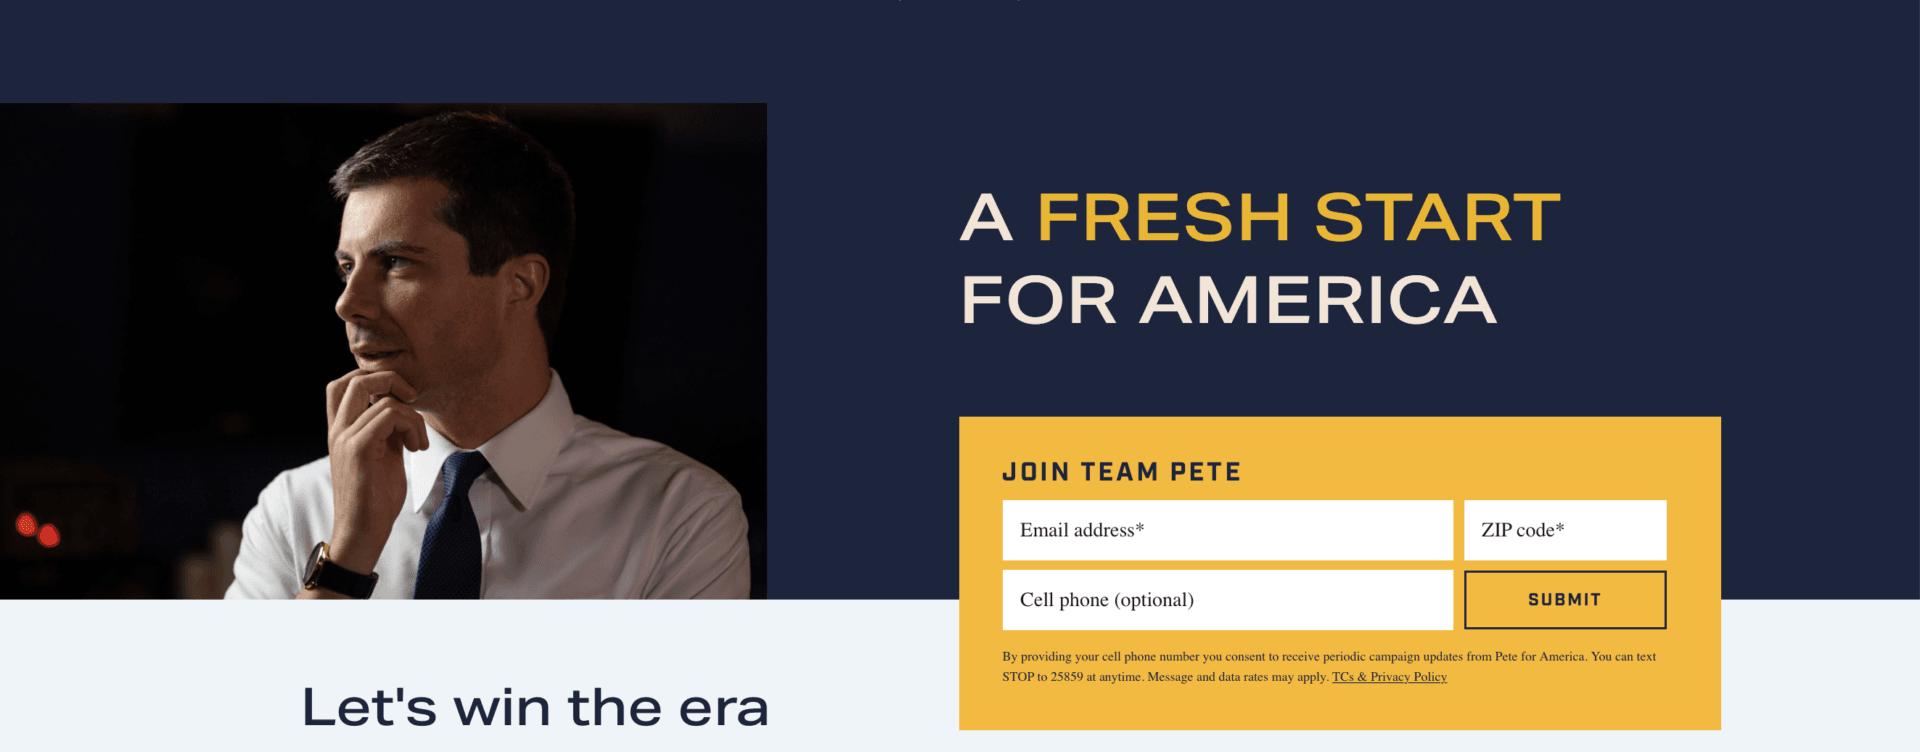 Pete Buttigieg campaign website (Screenshot / Internet Archive)